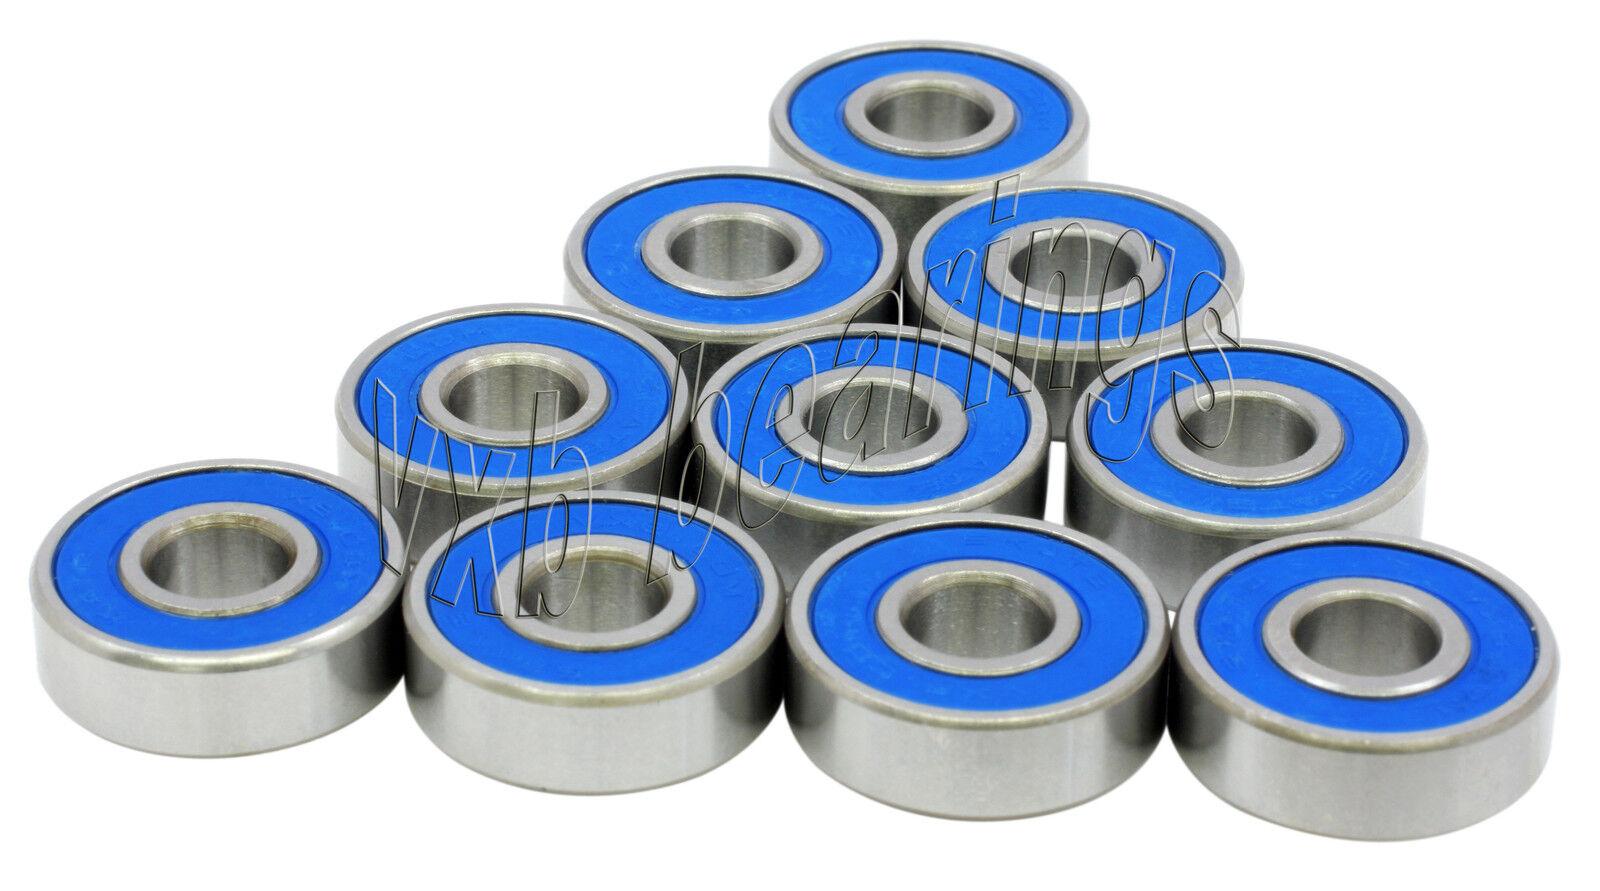 10 Bearing 623-2RS 3x10 Sealed 3x10x4 Miniature Ball Bearings 845